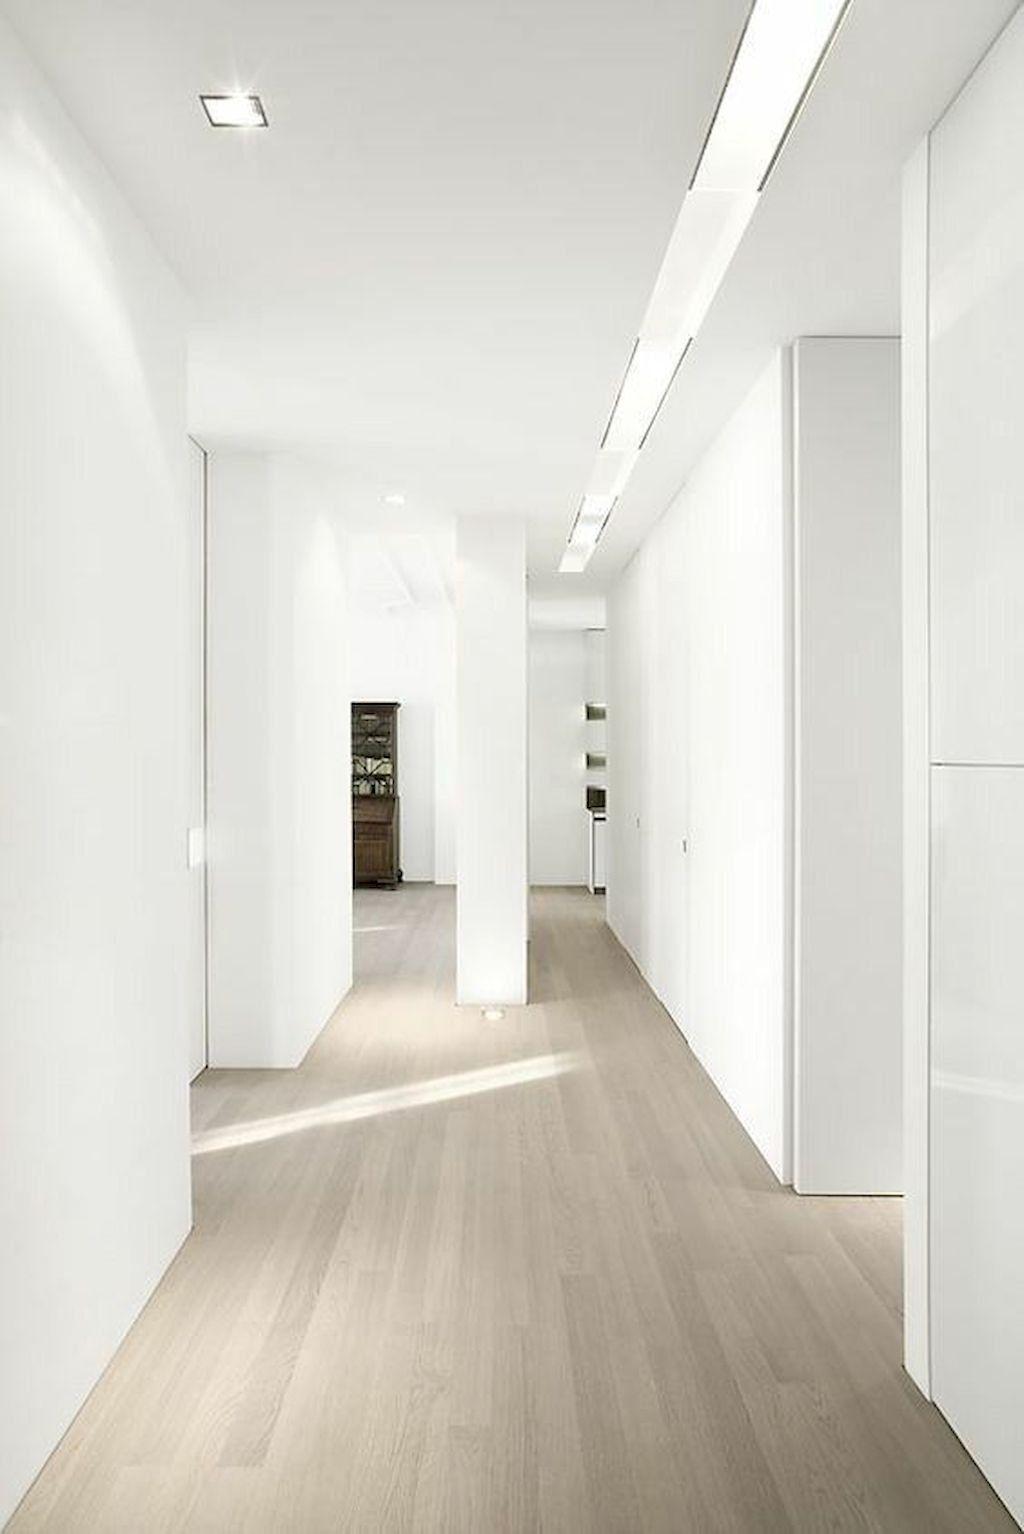 Perfect The Benefits Of Engineered Wooden Flooring Https Crithome Com The Benefits Of Enginee Living Room Wood Floor Maple Hardwood Floors Grey Wood Floors